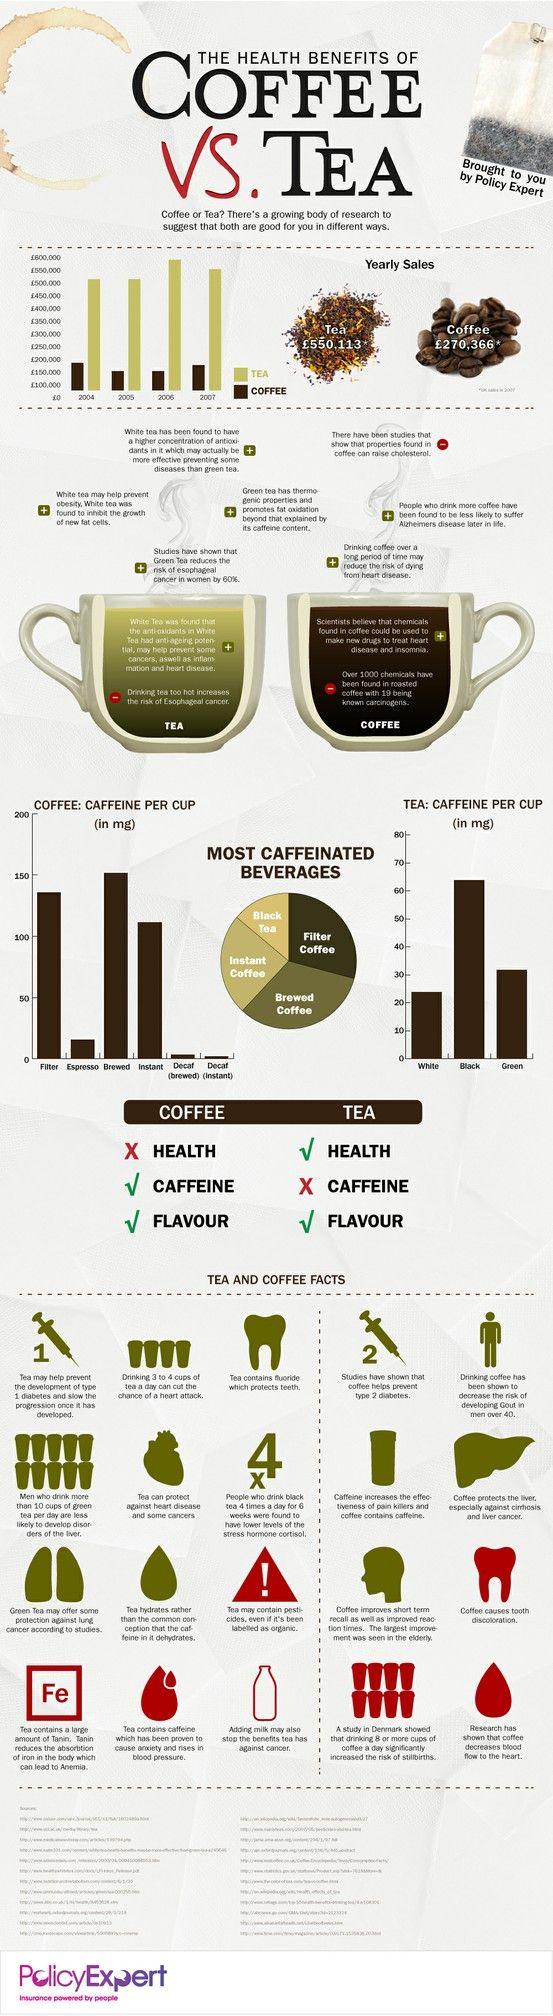 http://www.bonexpose.com/wp-content/uploads/2011/06/The-Health-Benefits-of-Coffee-vs-Tea-Infographic.jpg